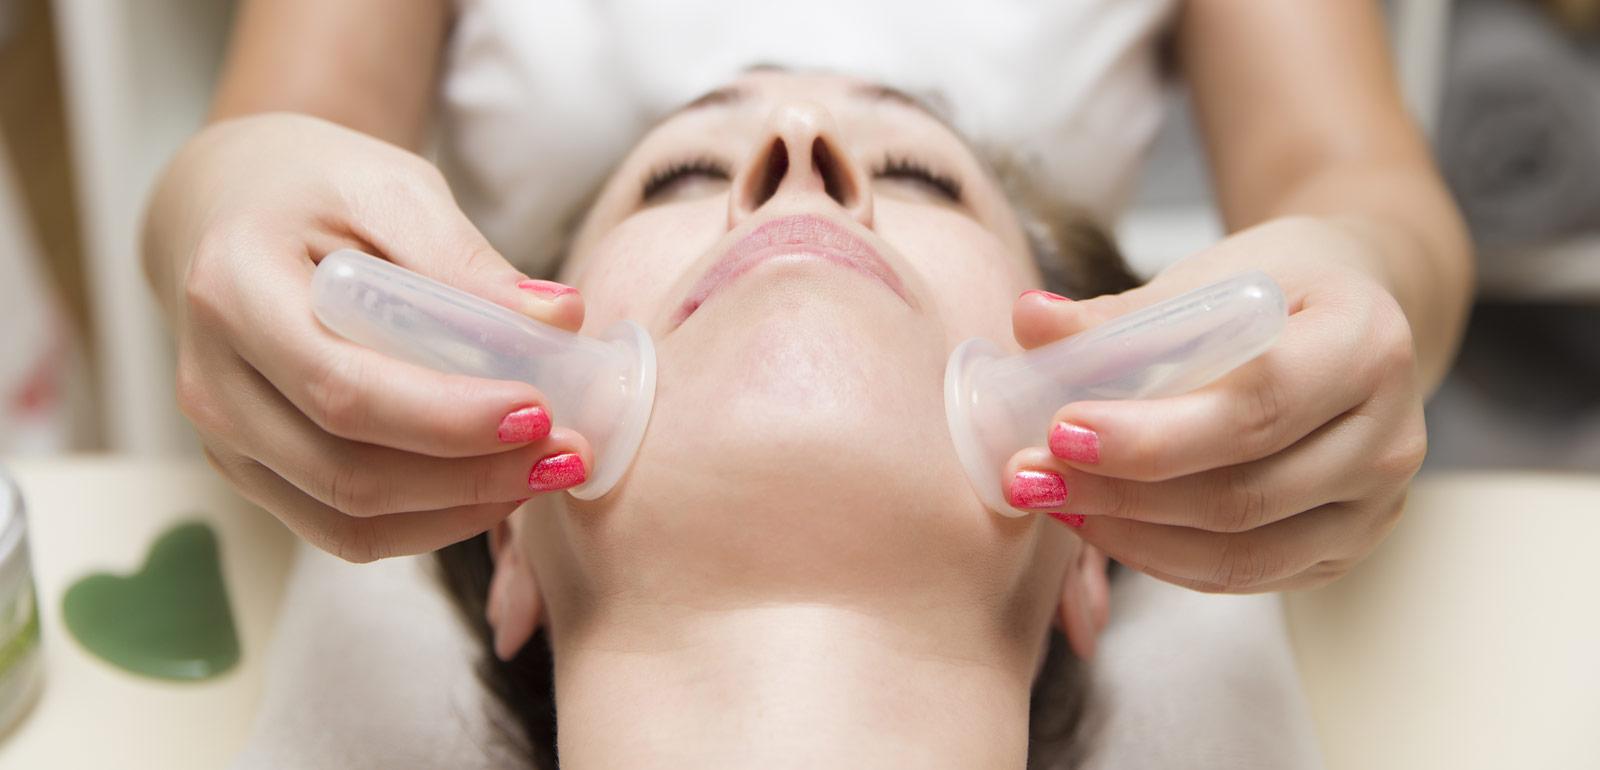 About Facial Massage